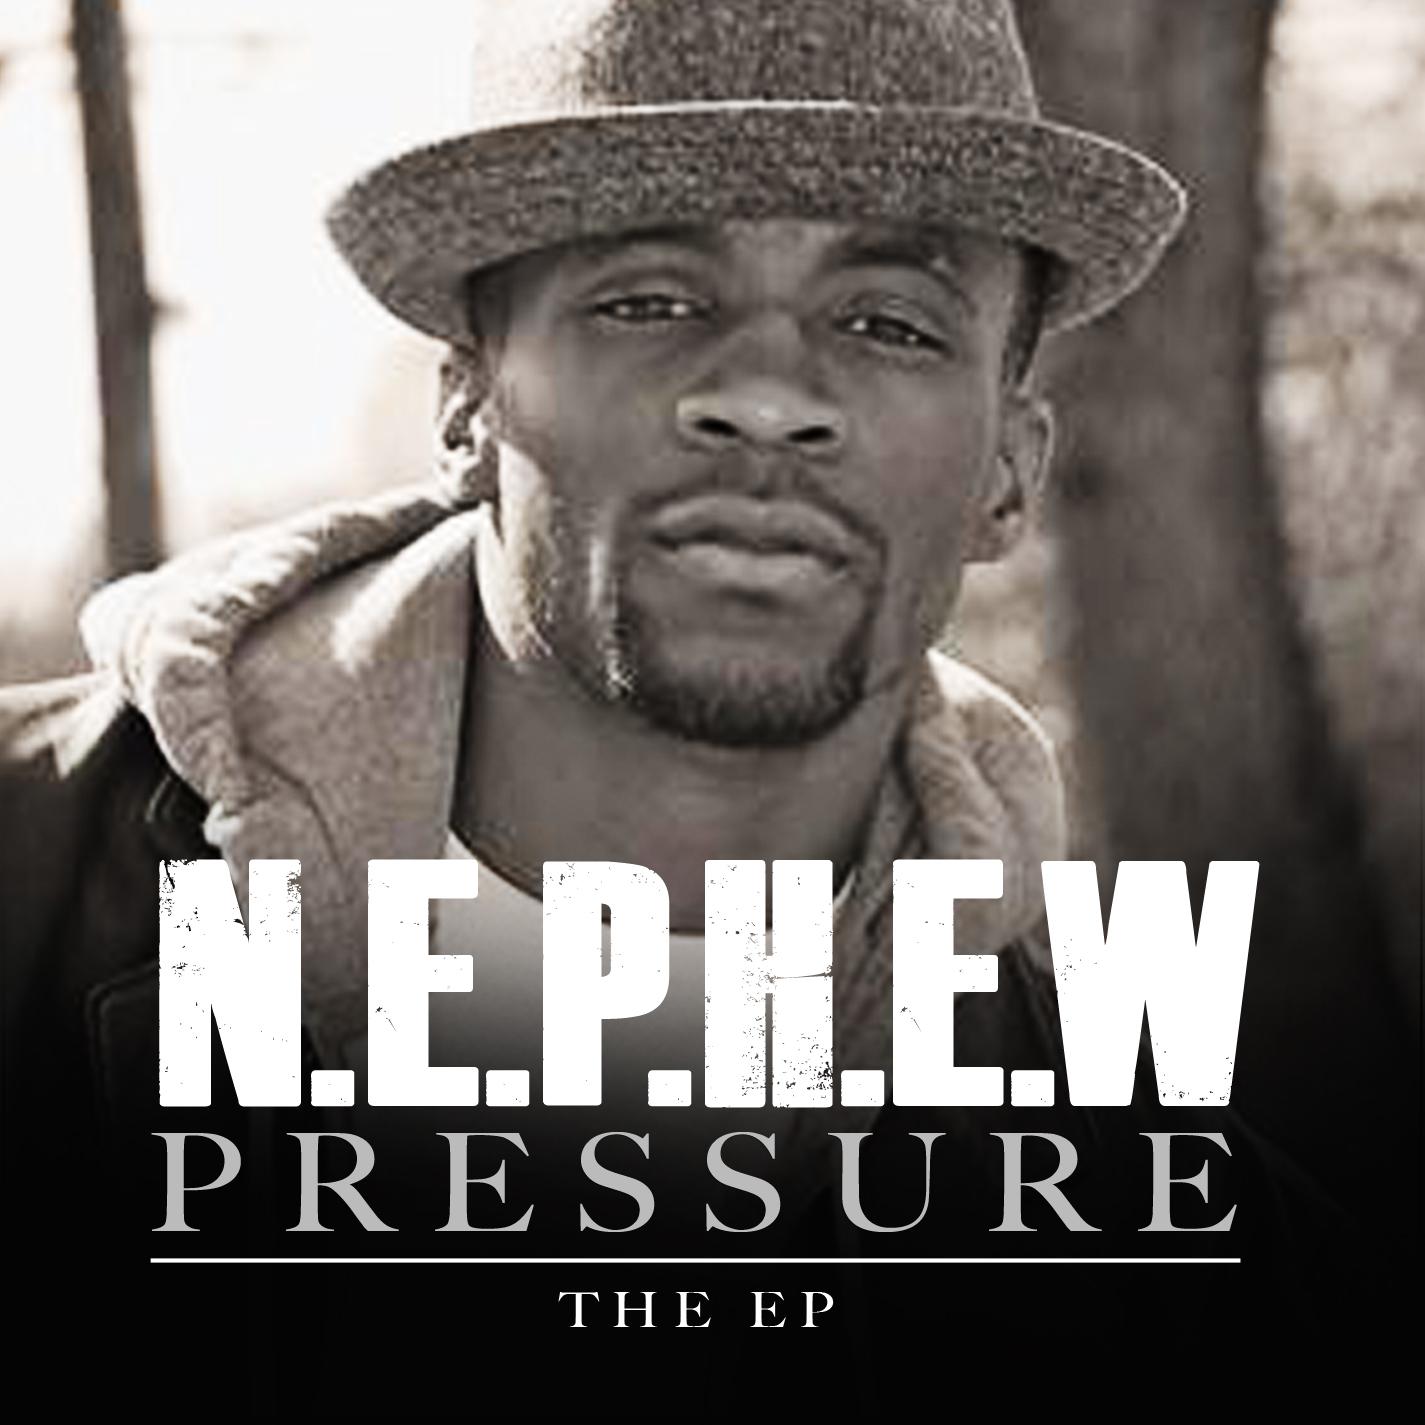 PRESSURE THE EP